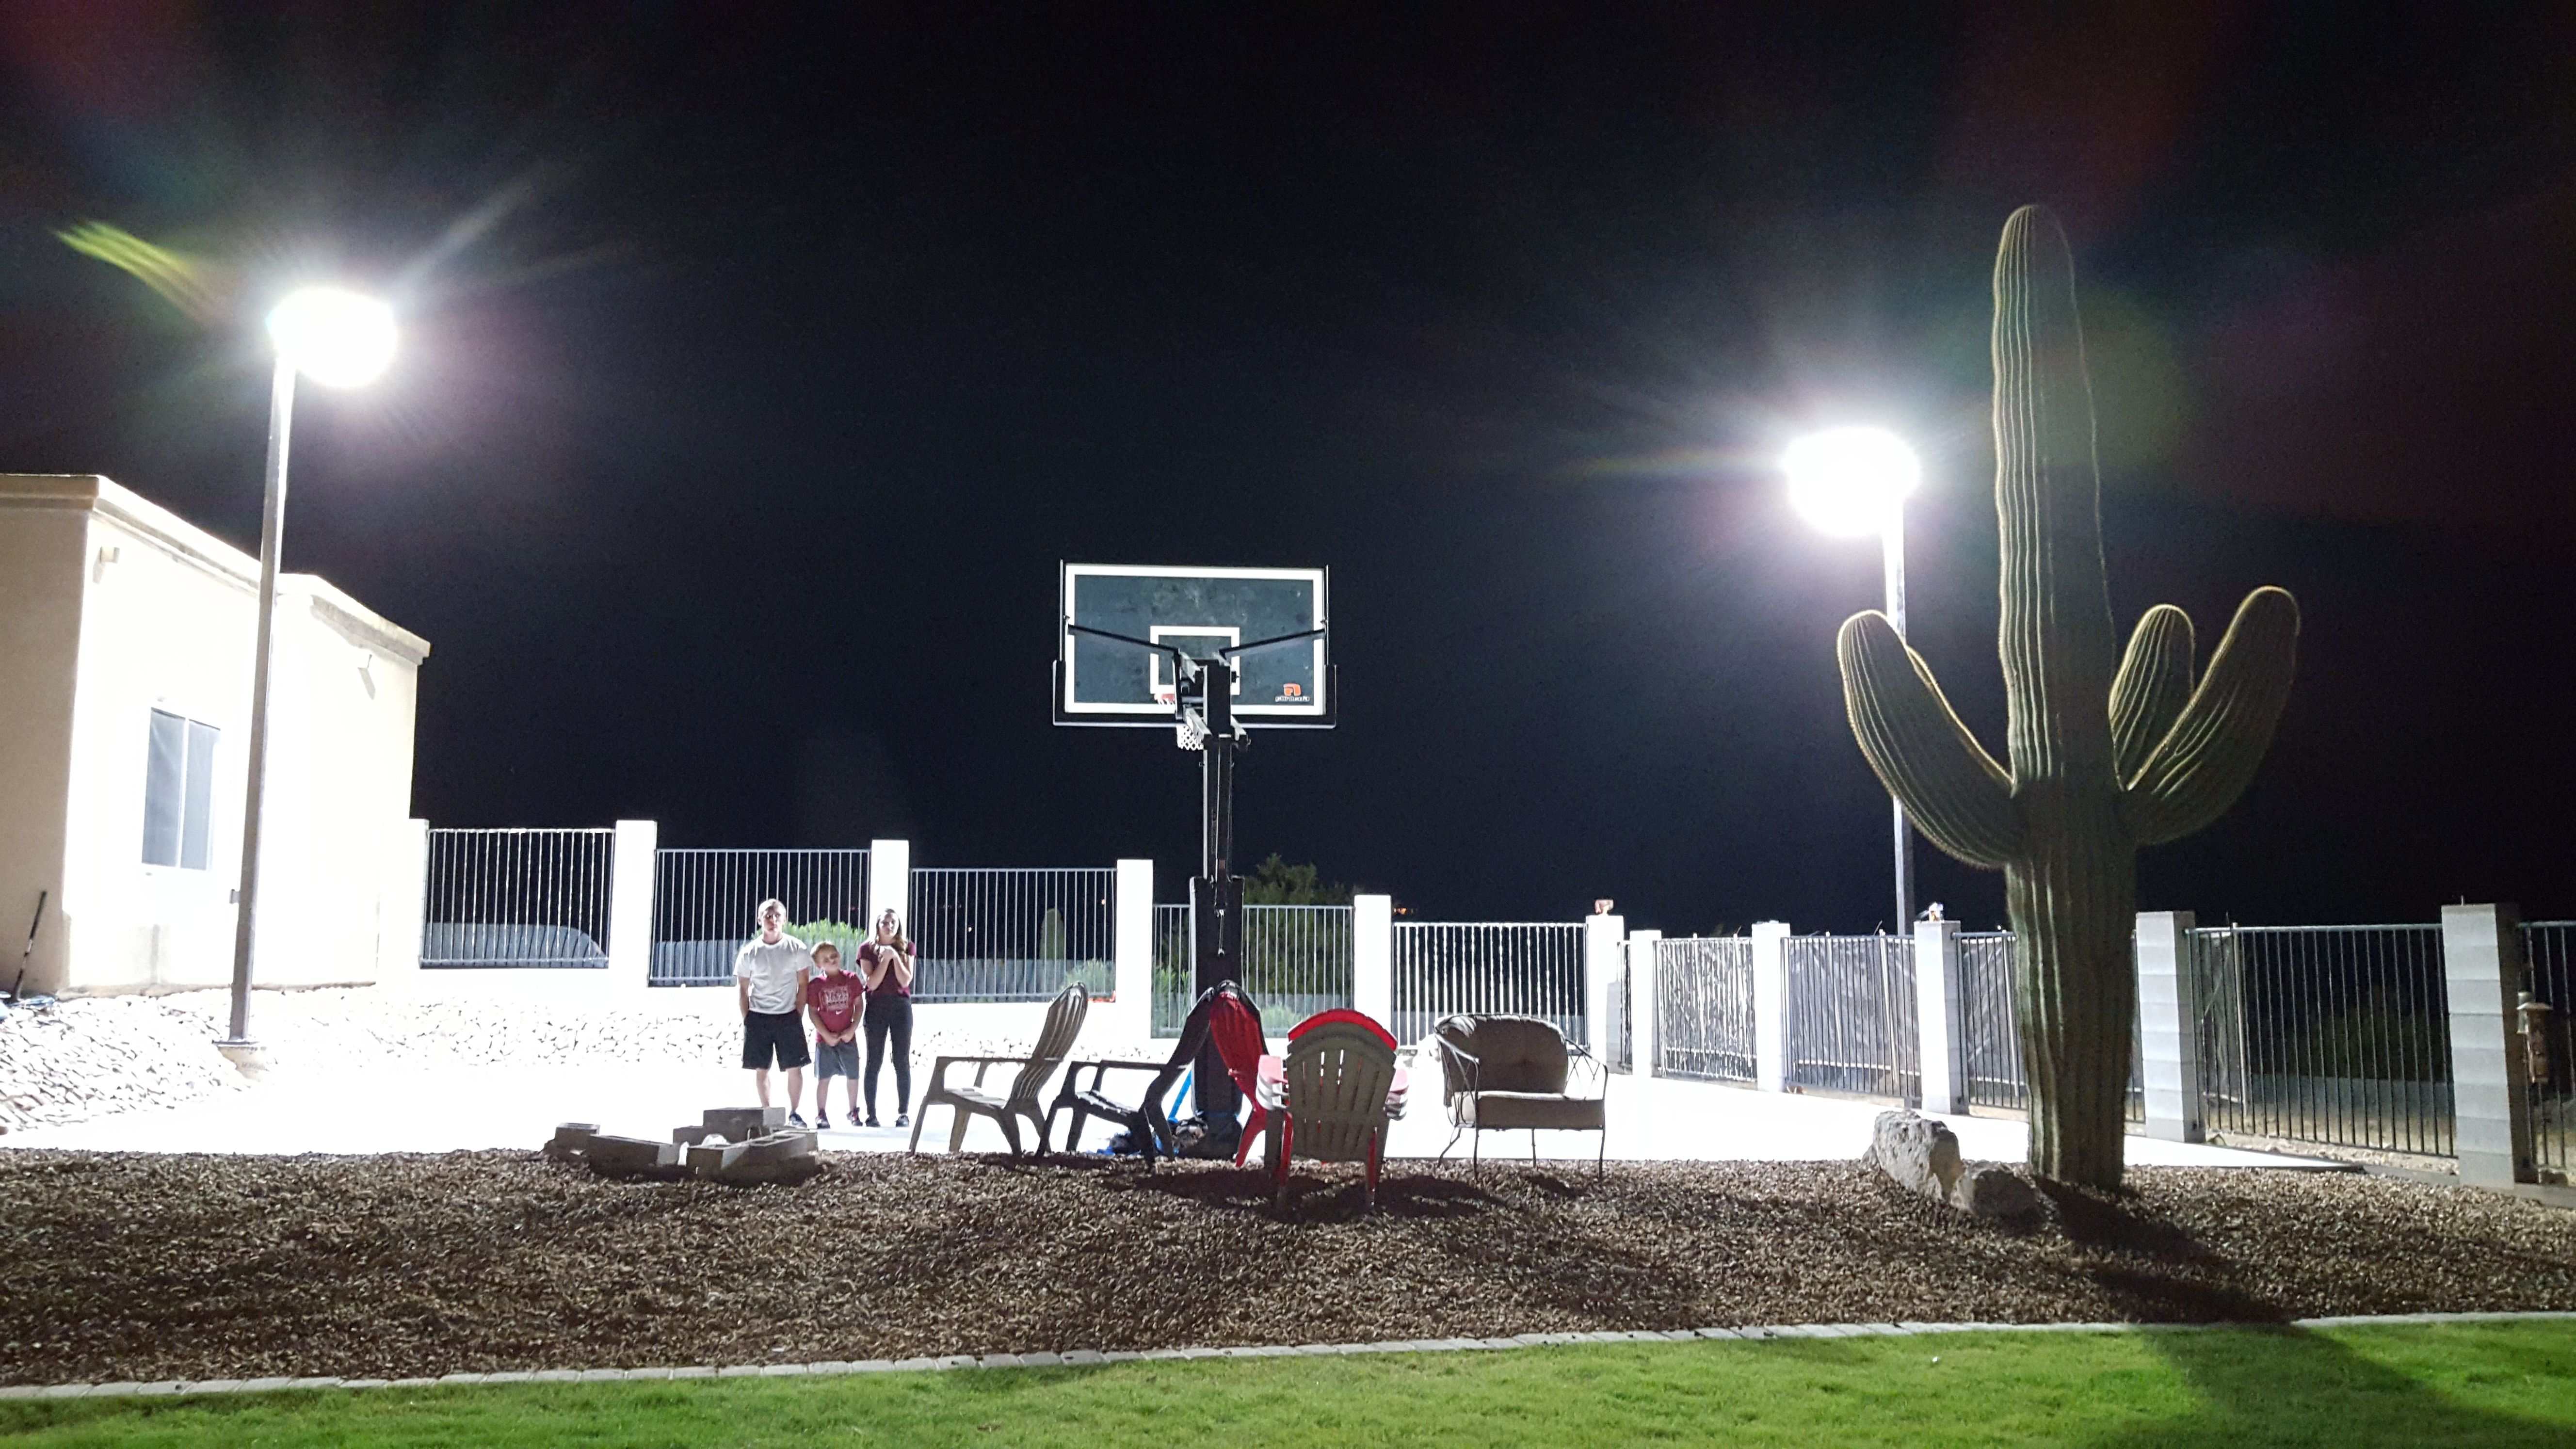 Dark sky lighting led basketball court for phoenix az dark arizona backyard sports court lighting dark sky compliant dark sky compliant lighting offers a aloadofball Gallery